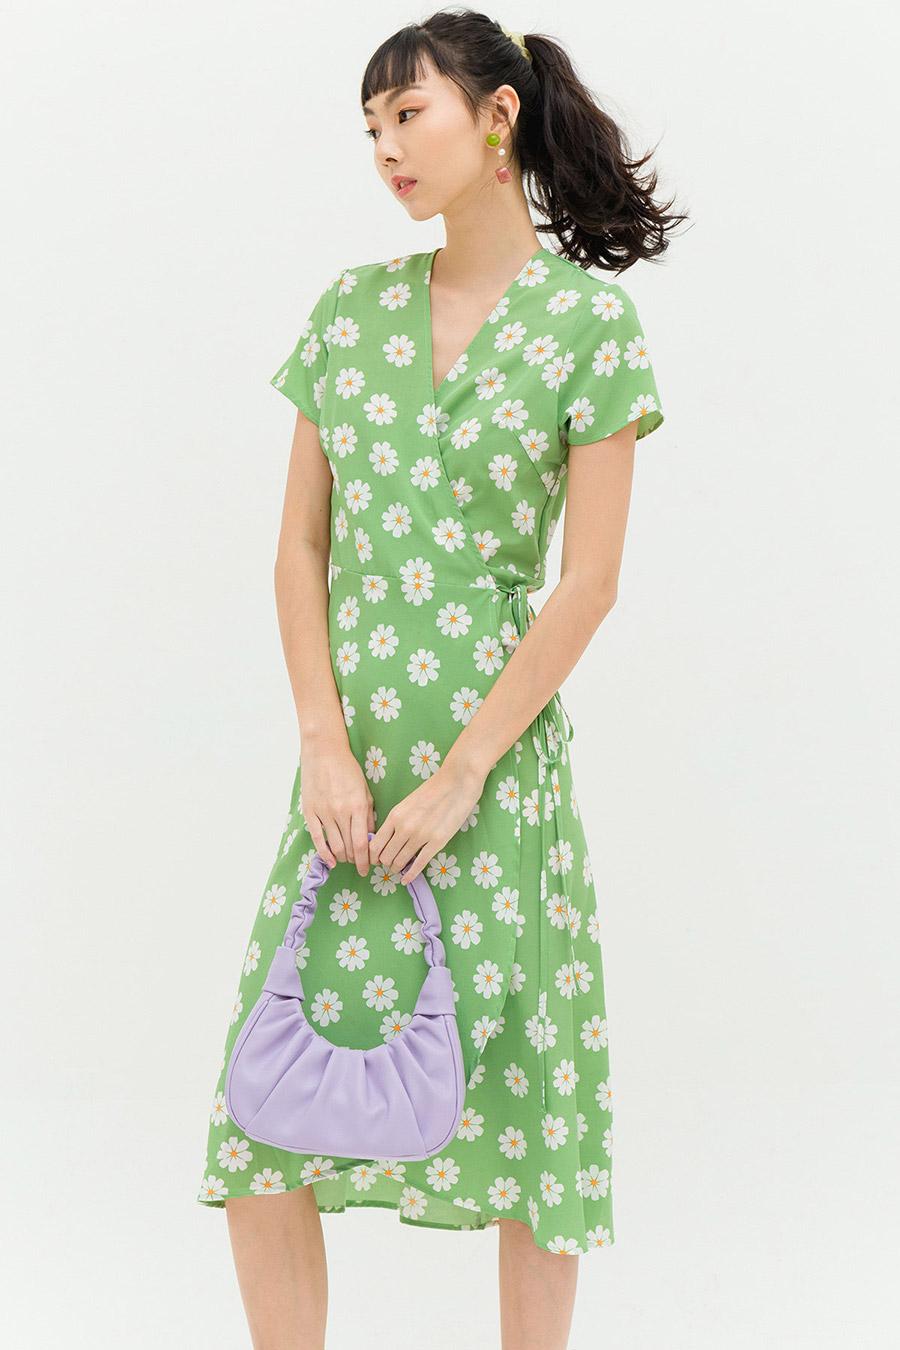 LOWE DRESS - SAGE FLEUR